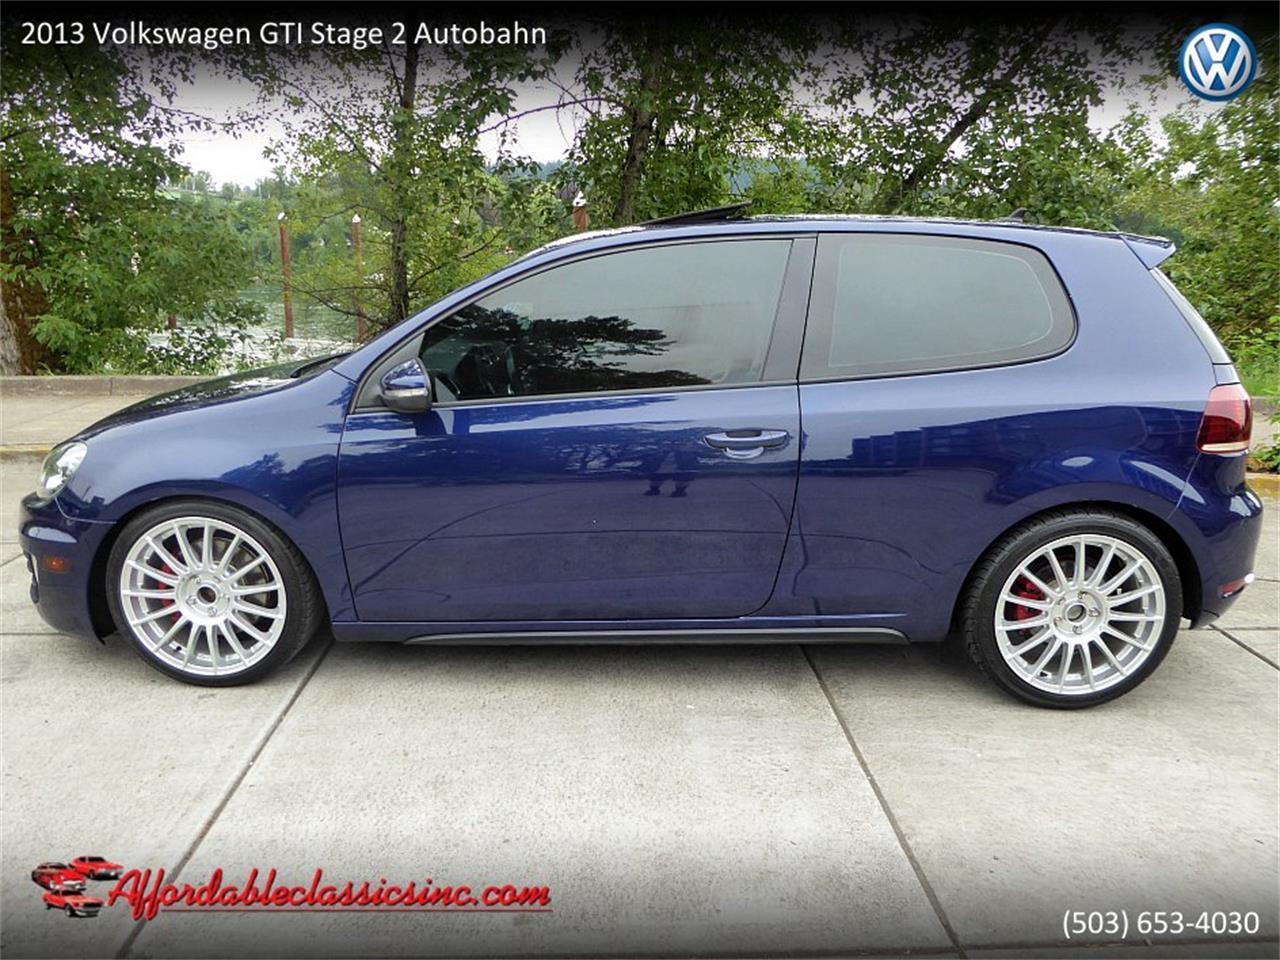 2013 Volkswagen Gti For Sale Classiccars Com Cc 1104642